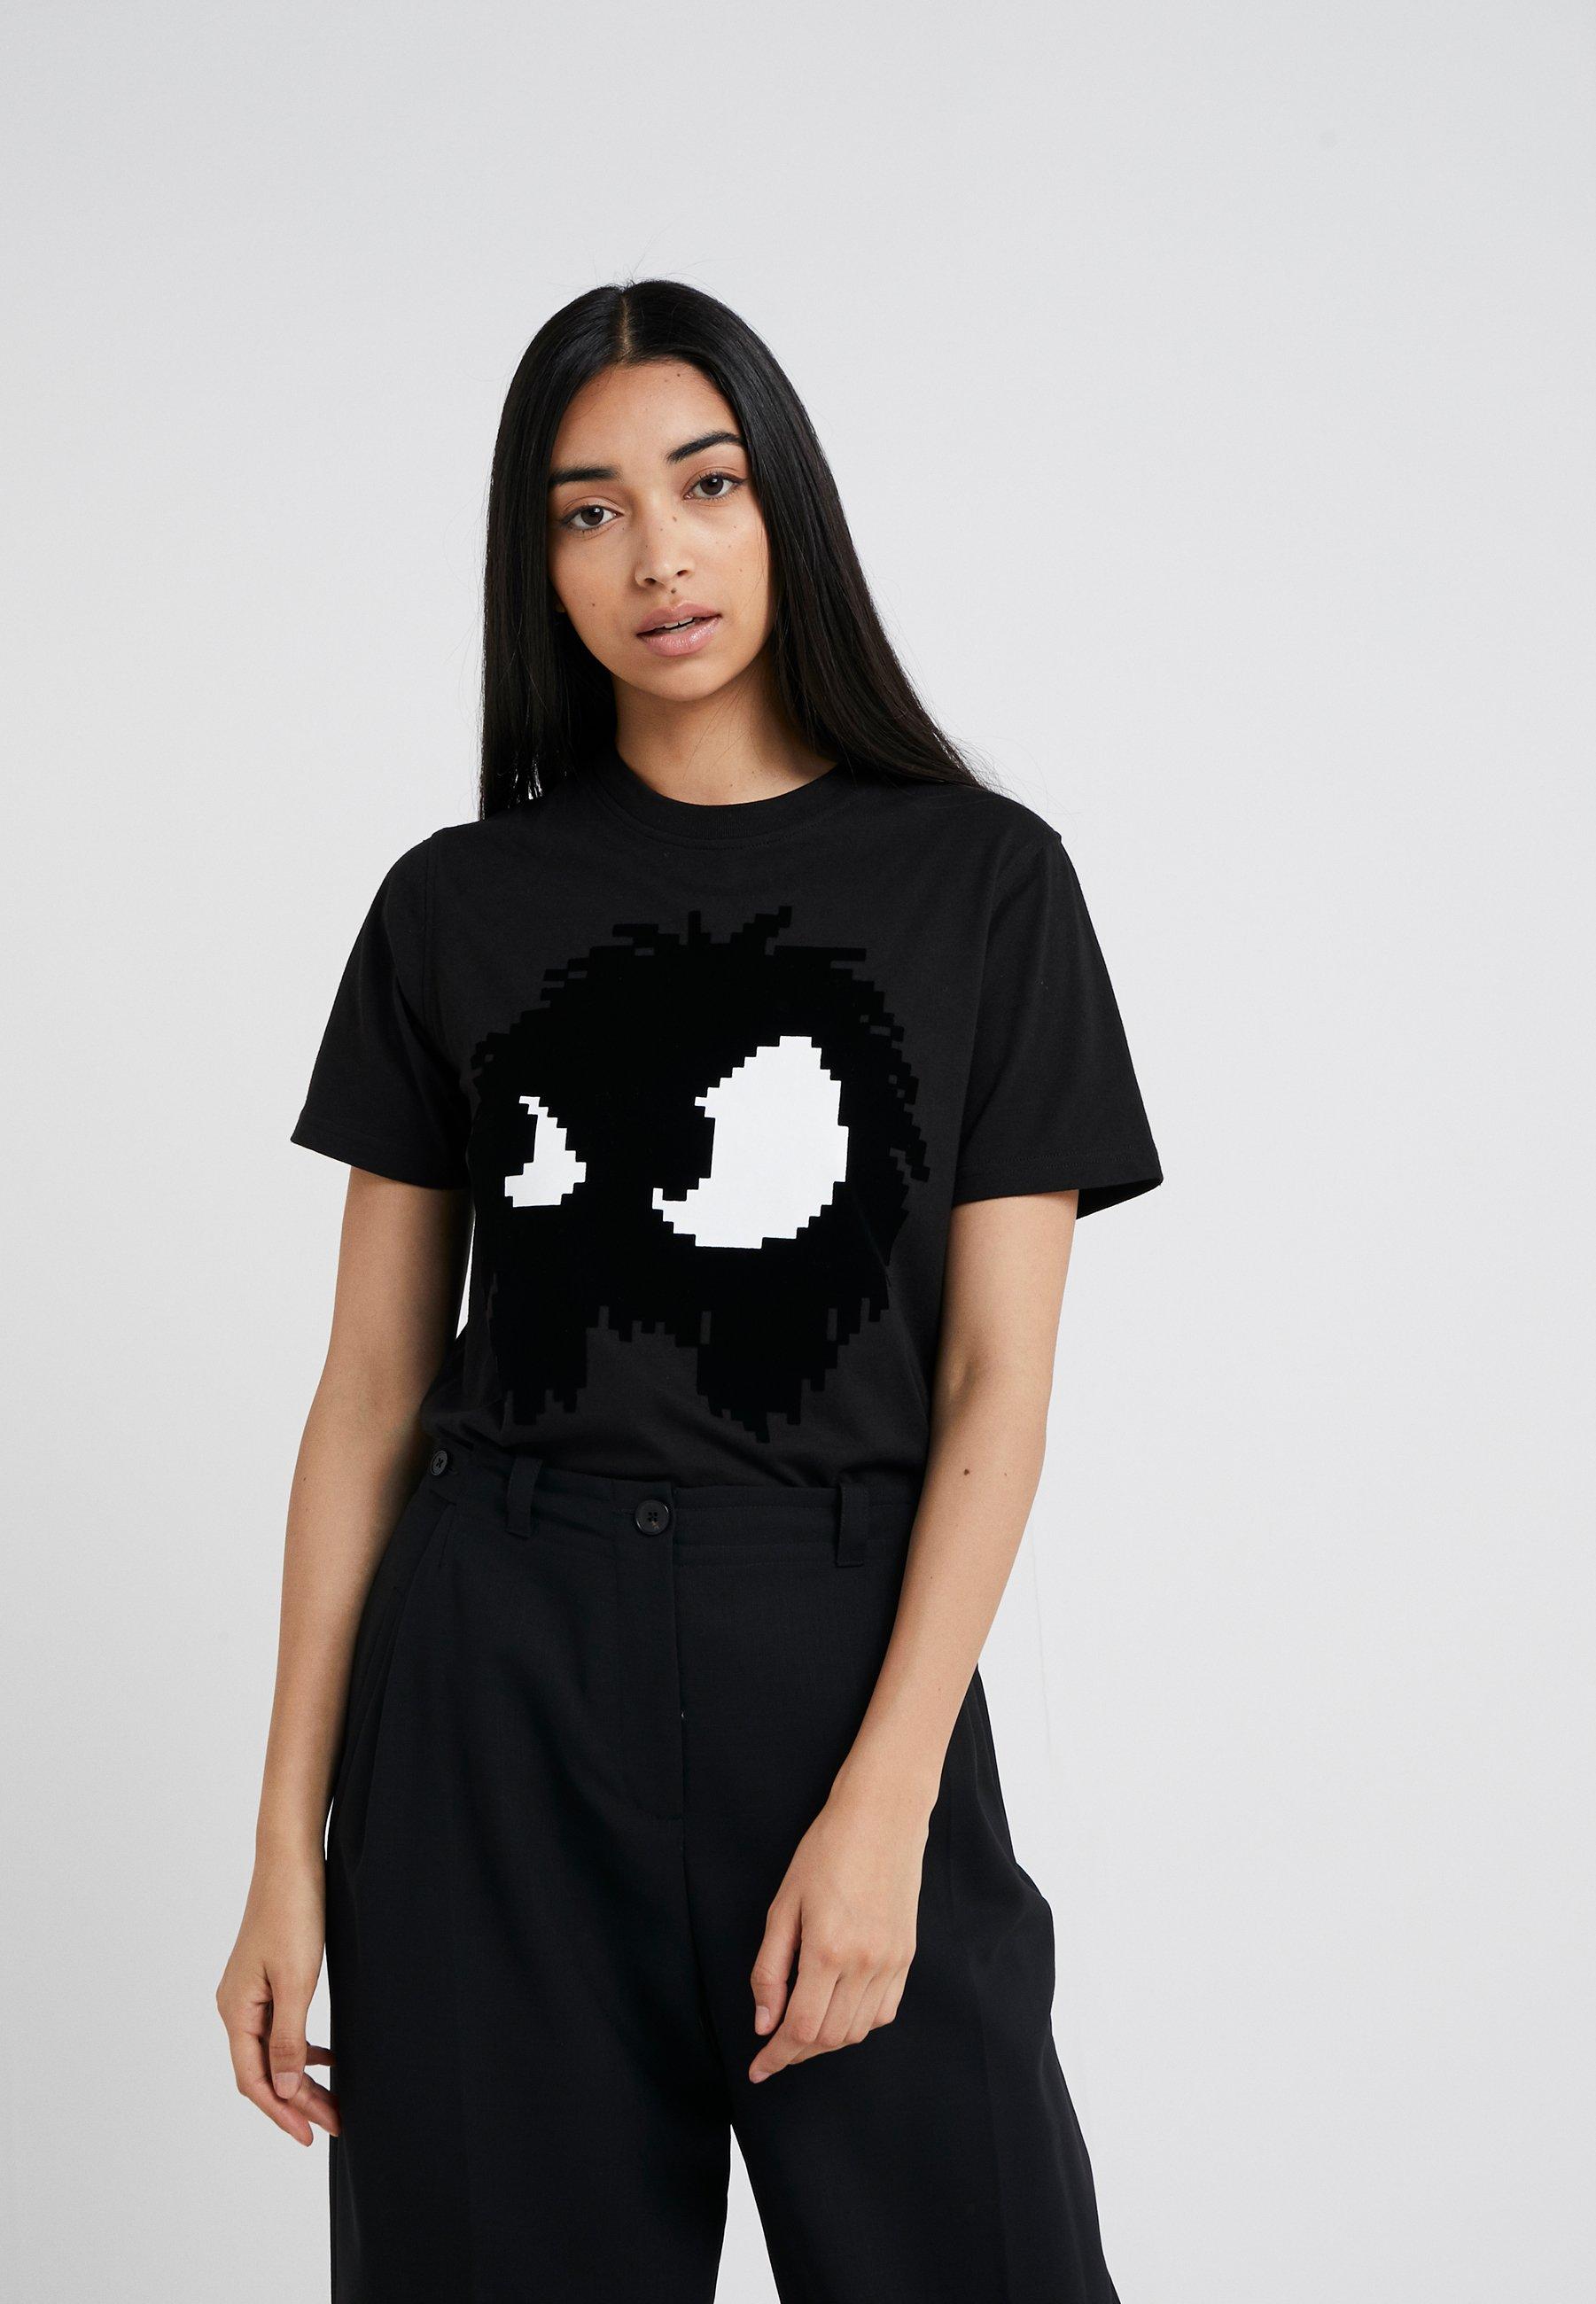 Band shirt TeeT Alexander Mcqueen Imprimé Mcq Black Darkest thrCxQsdoB